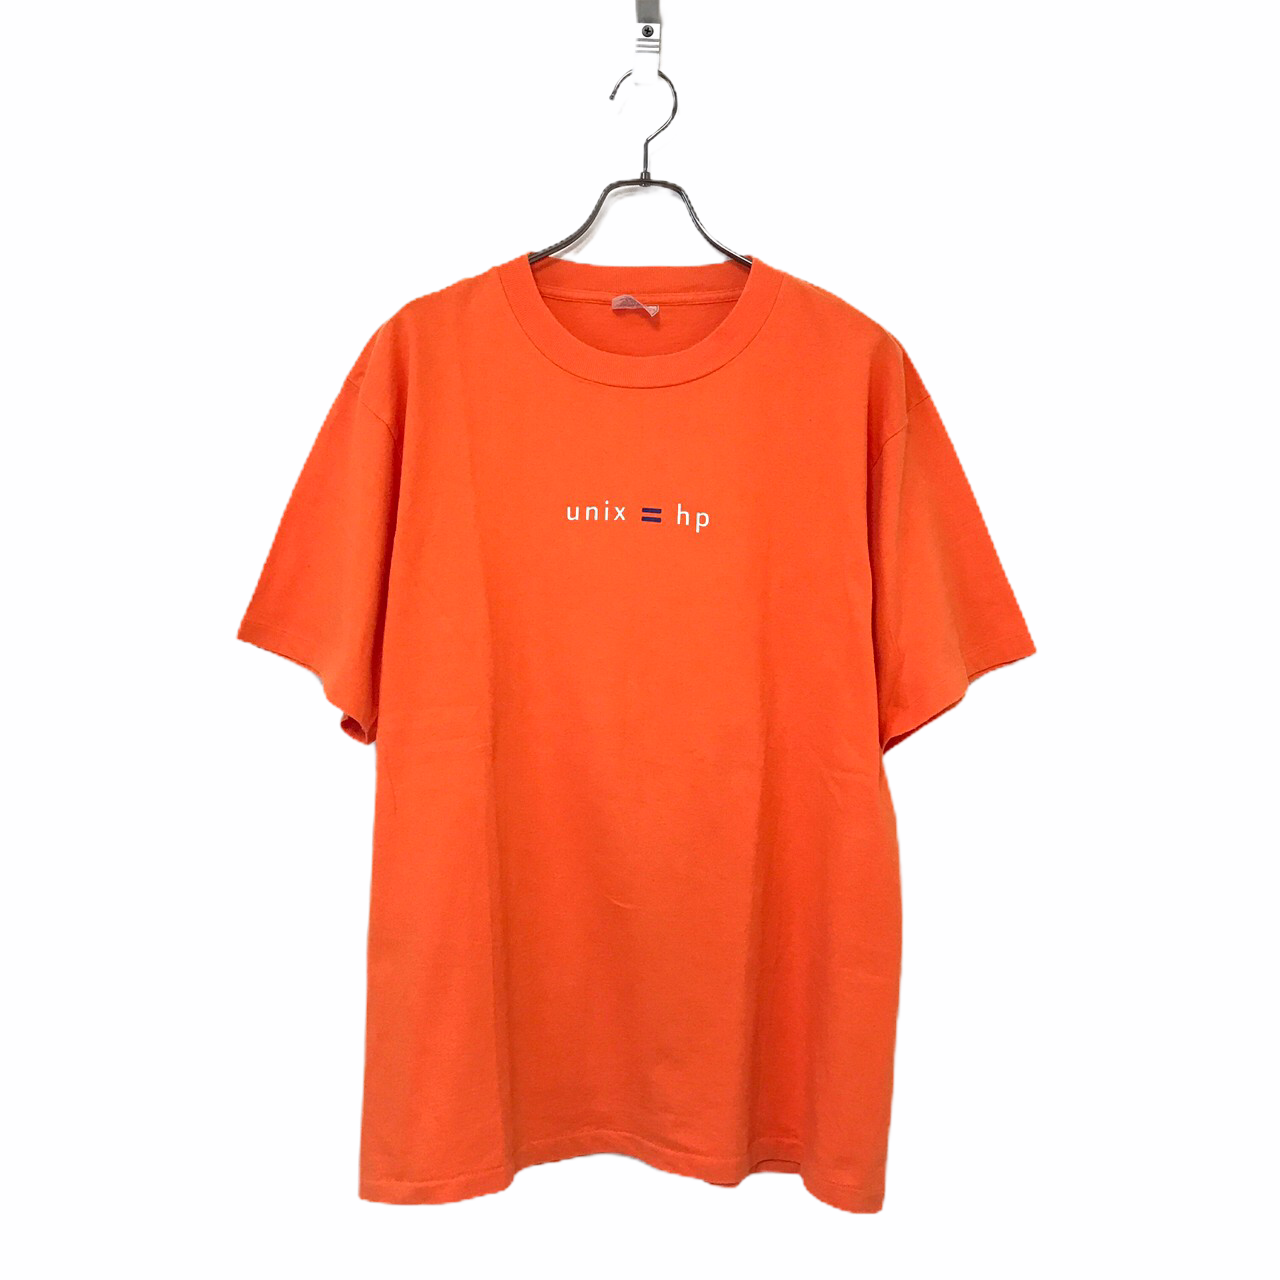 90's United Sports HP Hewlett-Packard unix T-shirt made in USA size L Orange